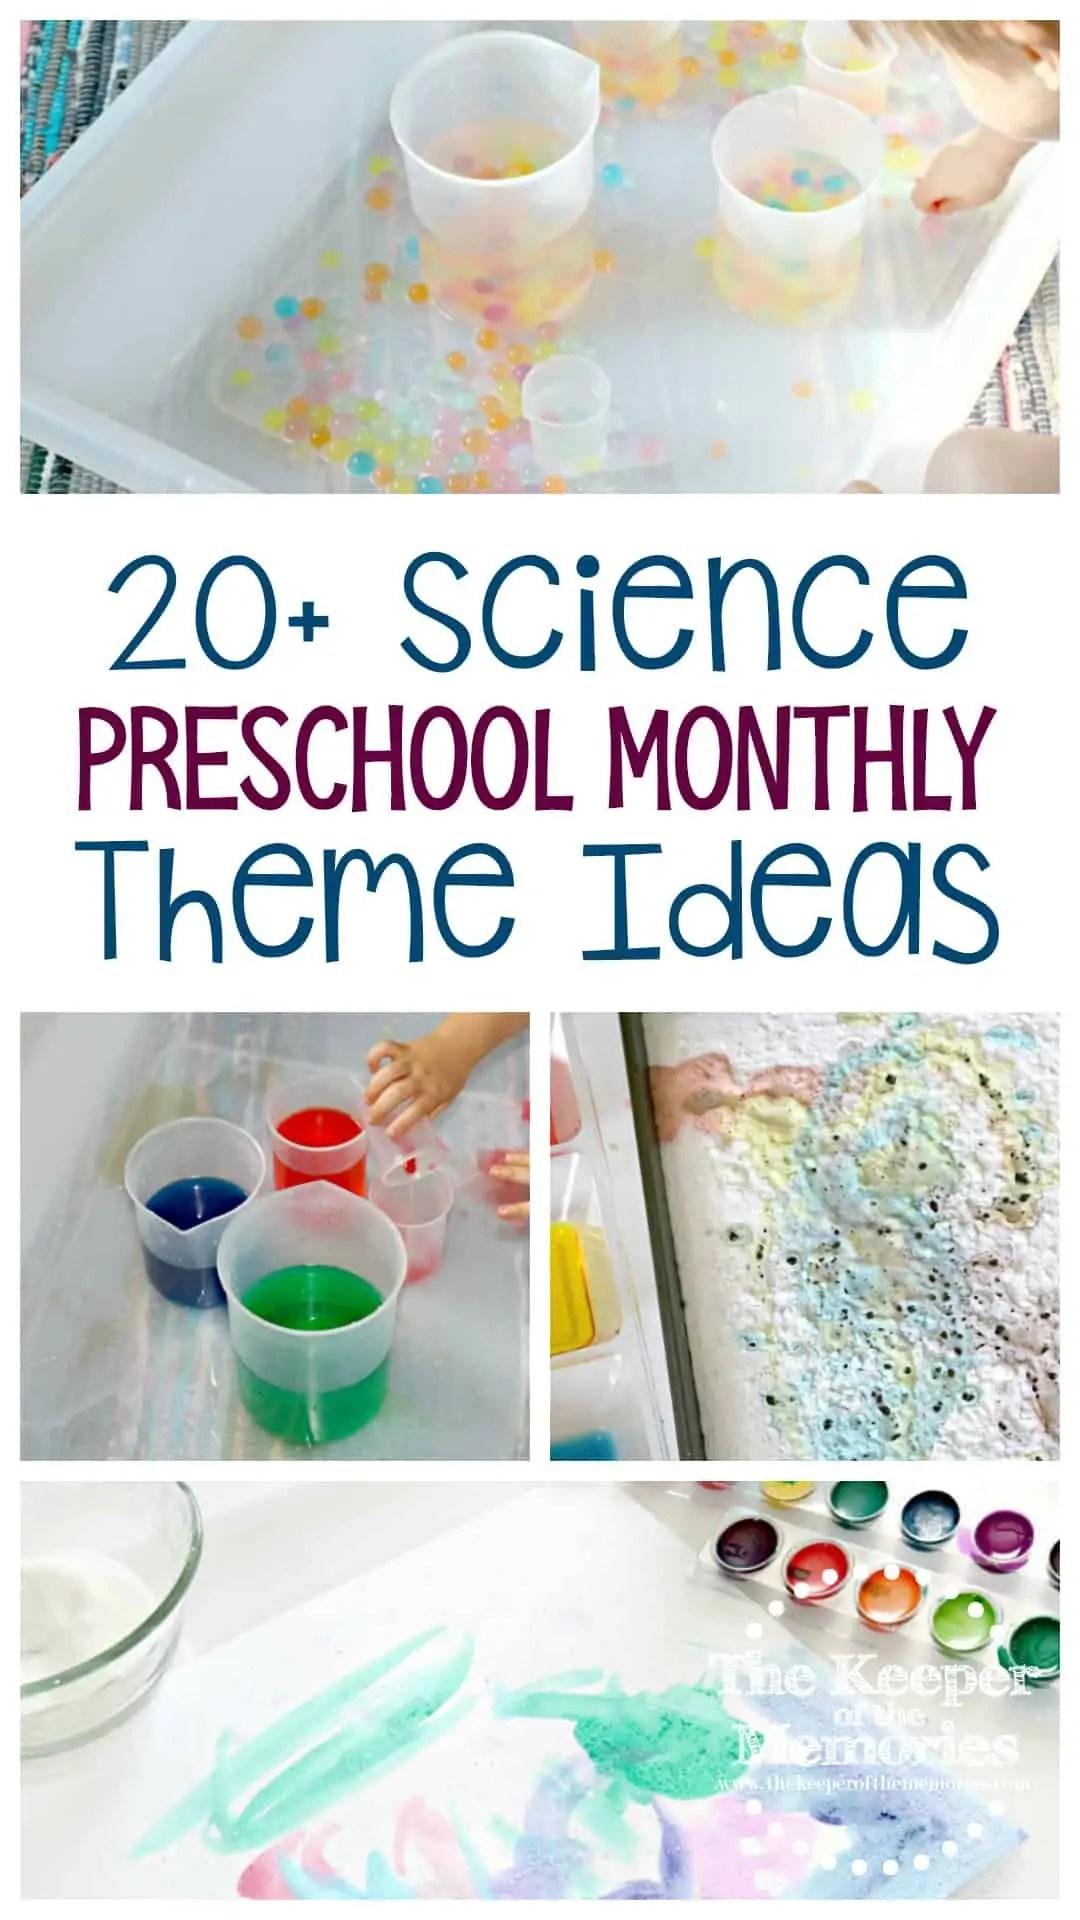 20 Science Preschool Monthly Theme Ideas